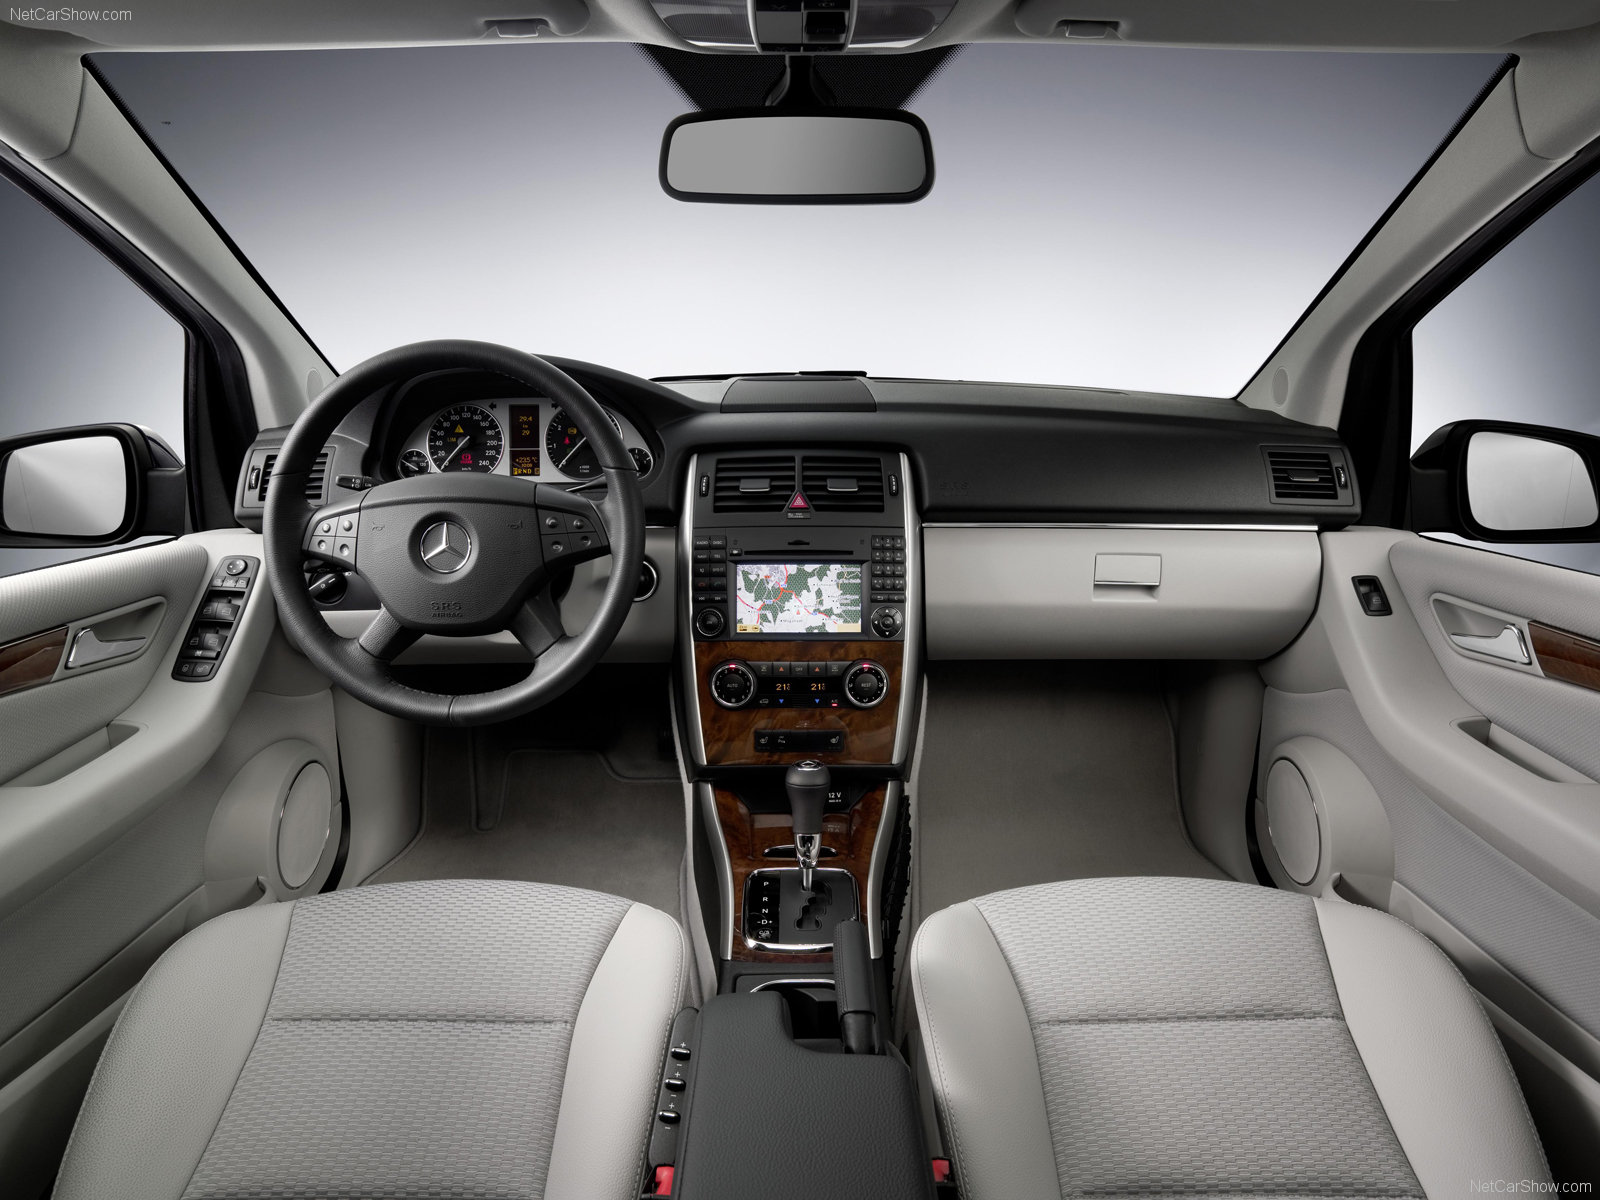 http://3.bp.blogspot.com/_7gQb5otWShQ/S_g8hkJqMxI/AAAAAAAAAGo/47iqRl_3NyM/s1600/Mercedes-Benz-B-Class_2009_1600x1200_wallpaper_24.jpg